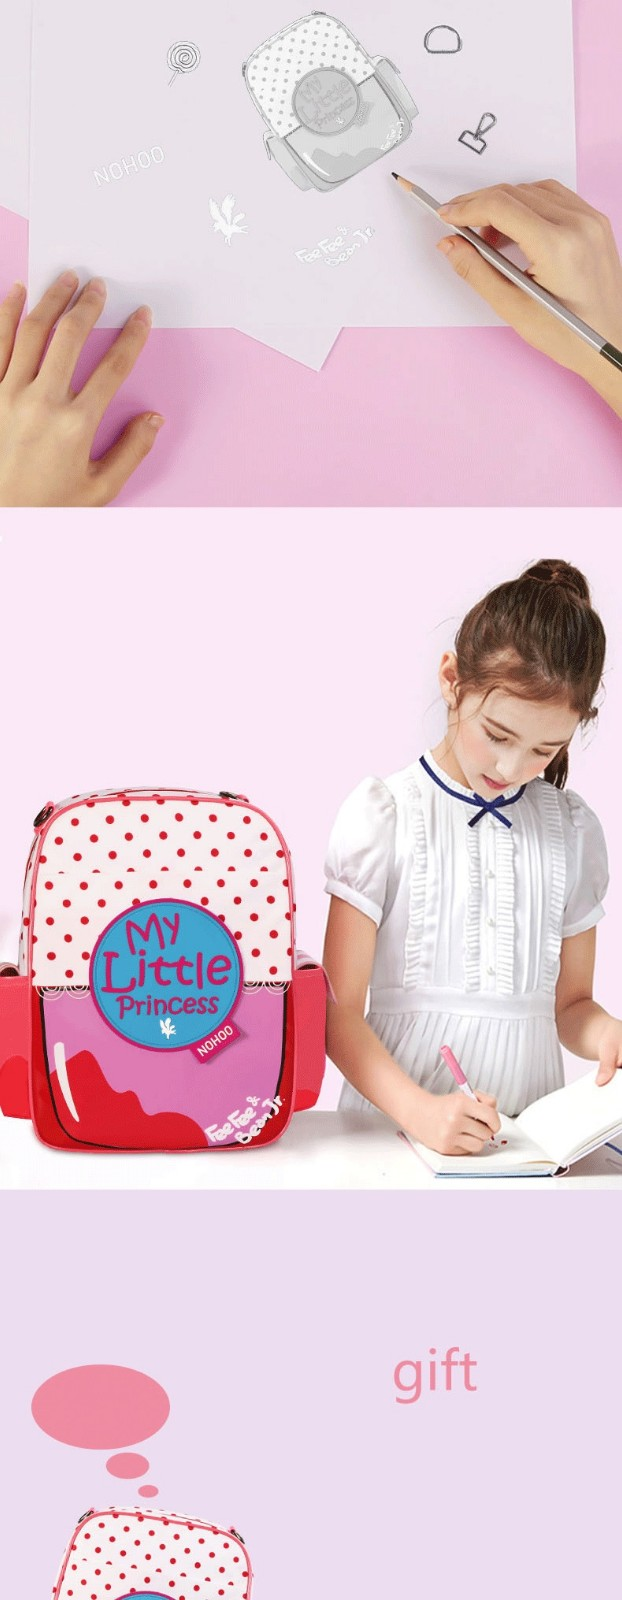 product-Nohoo 2019 new arrival waterproof lightweight PU 3D cartoon children school bag for girls-NO